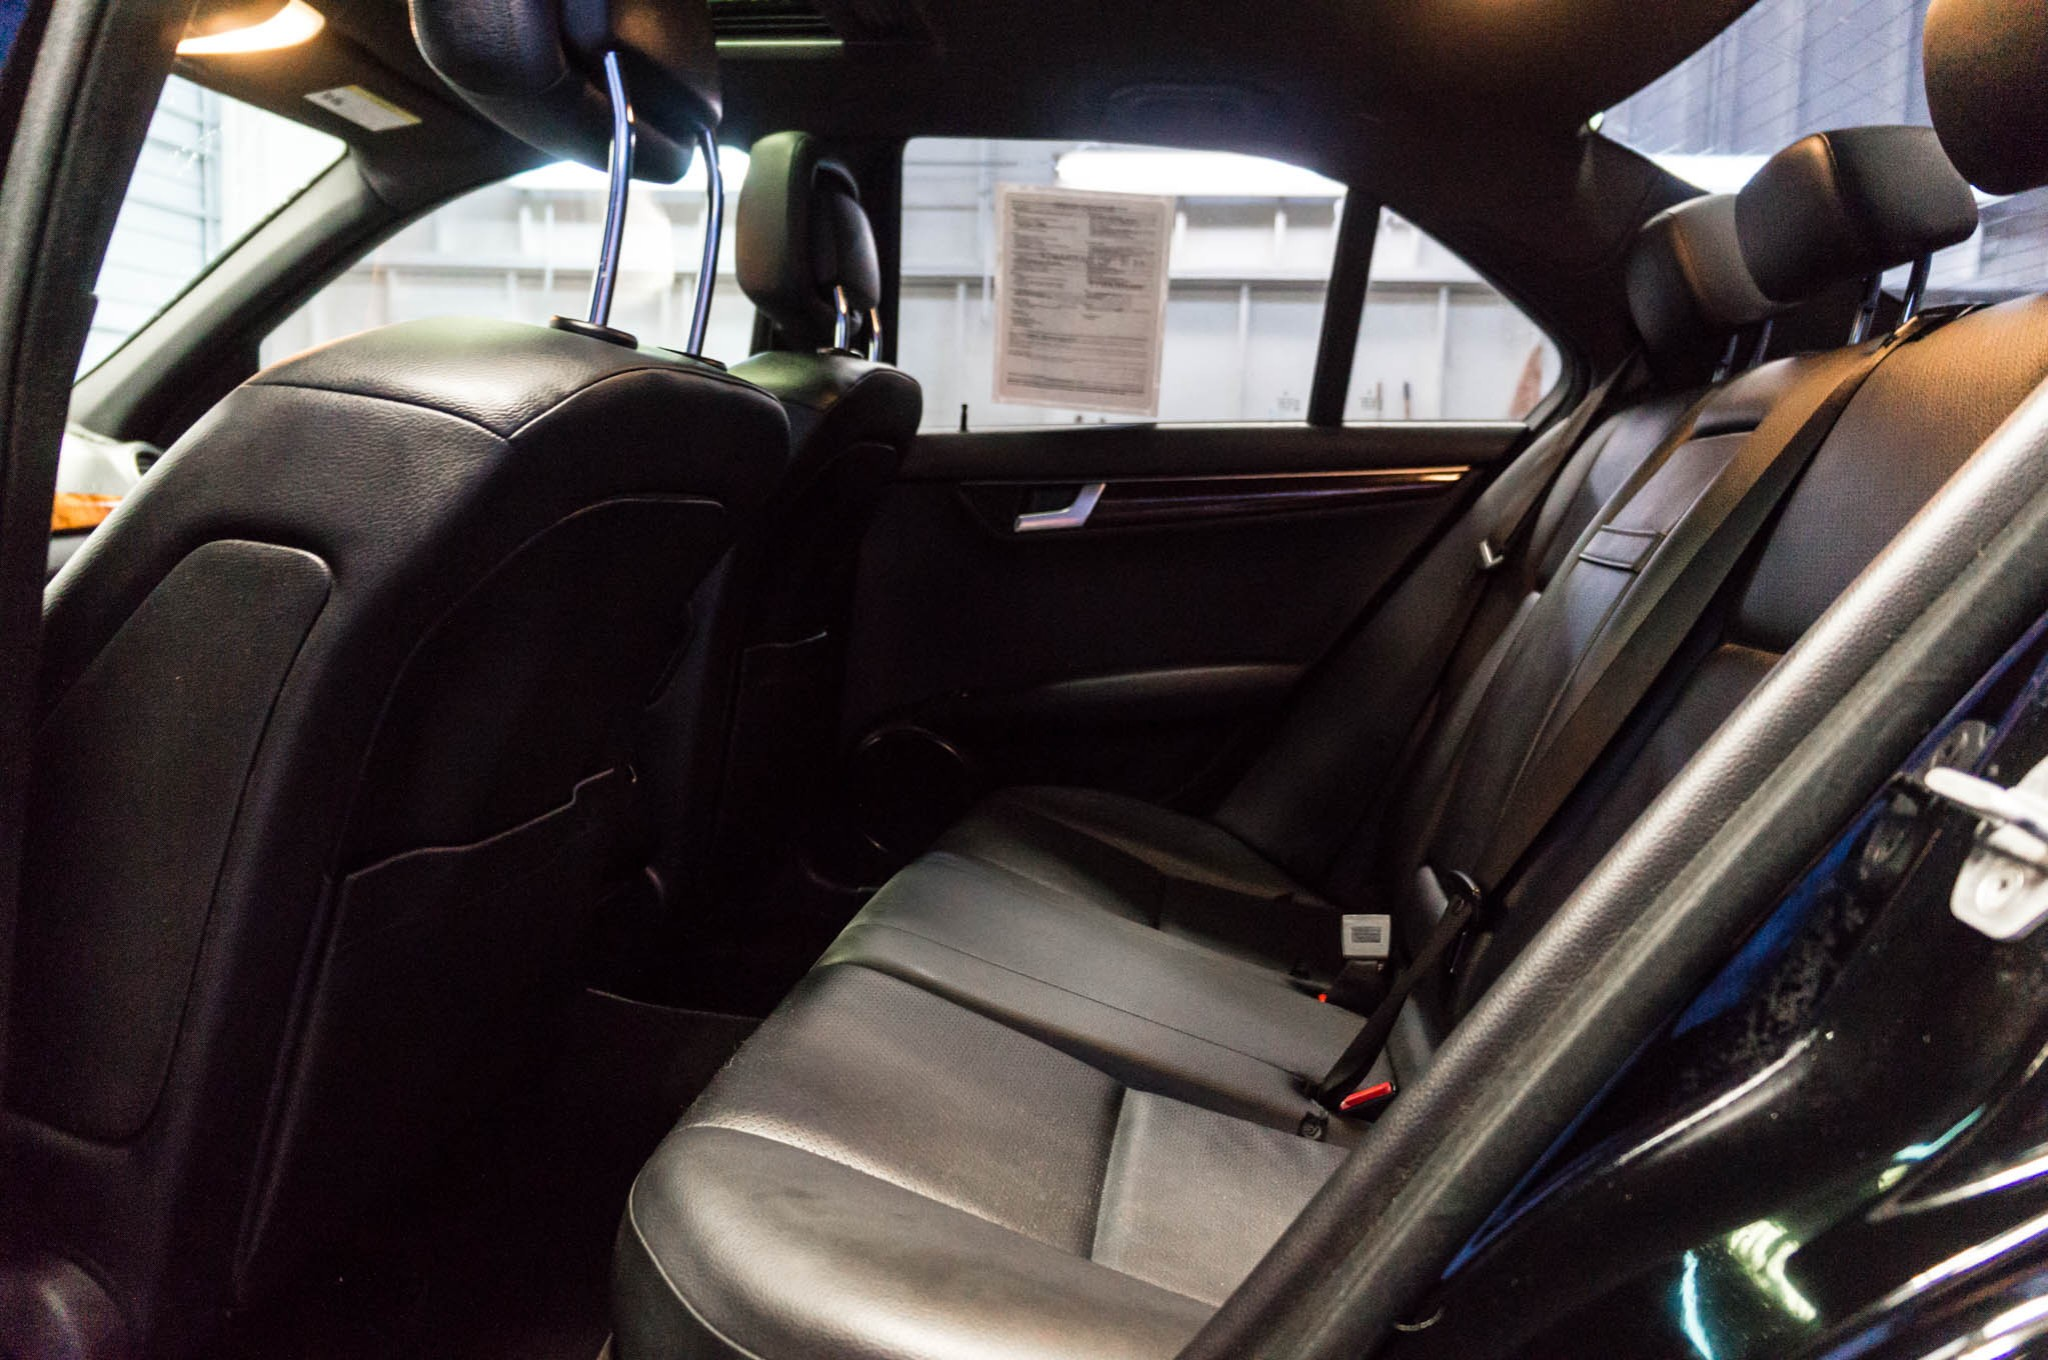 2012 mercedes-benz c300 4matic awd - northwest motorsport